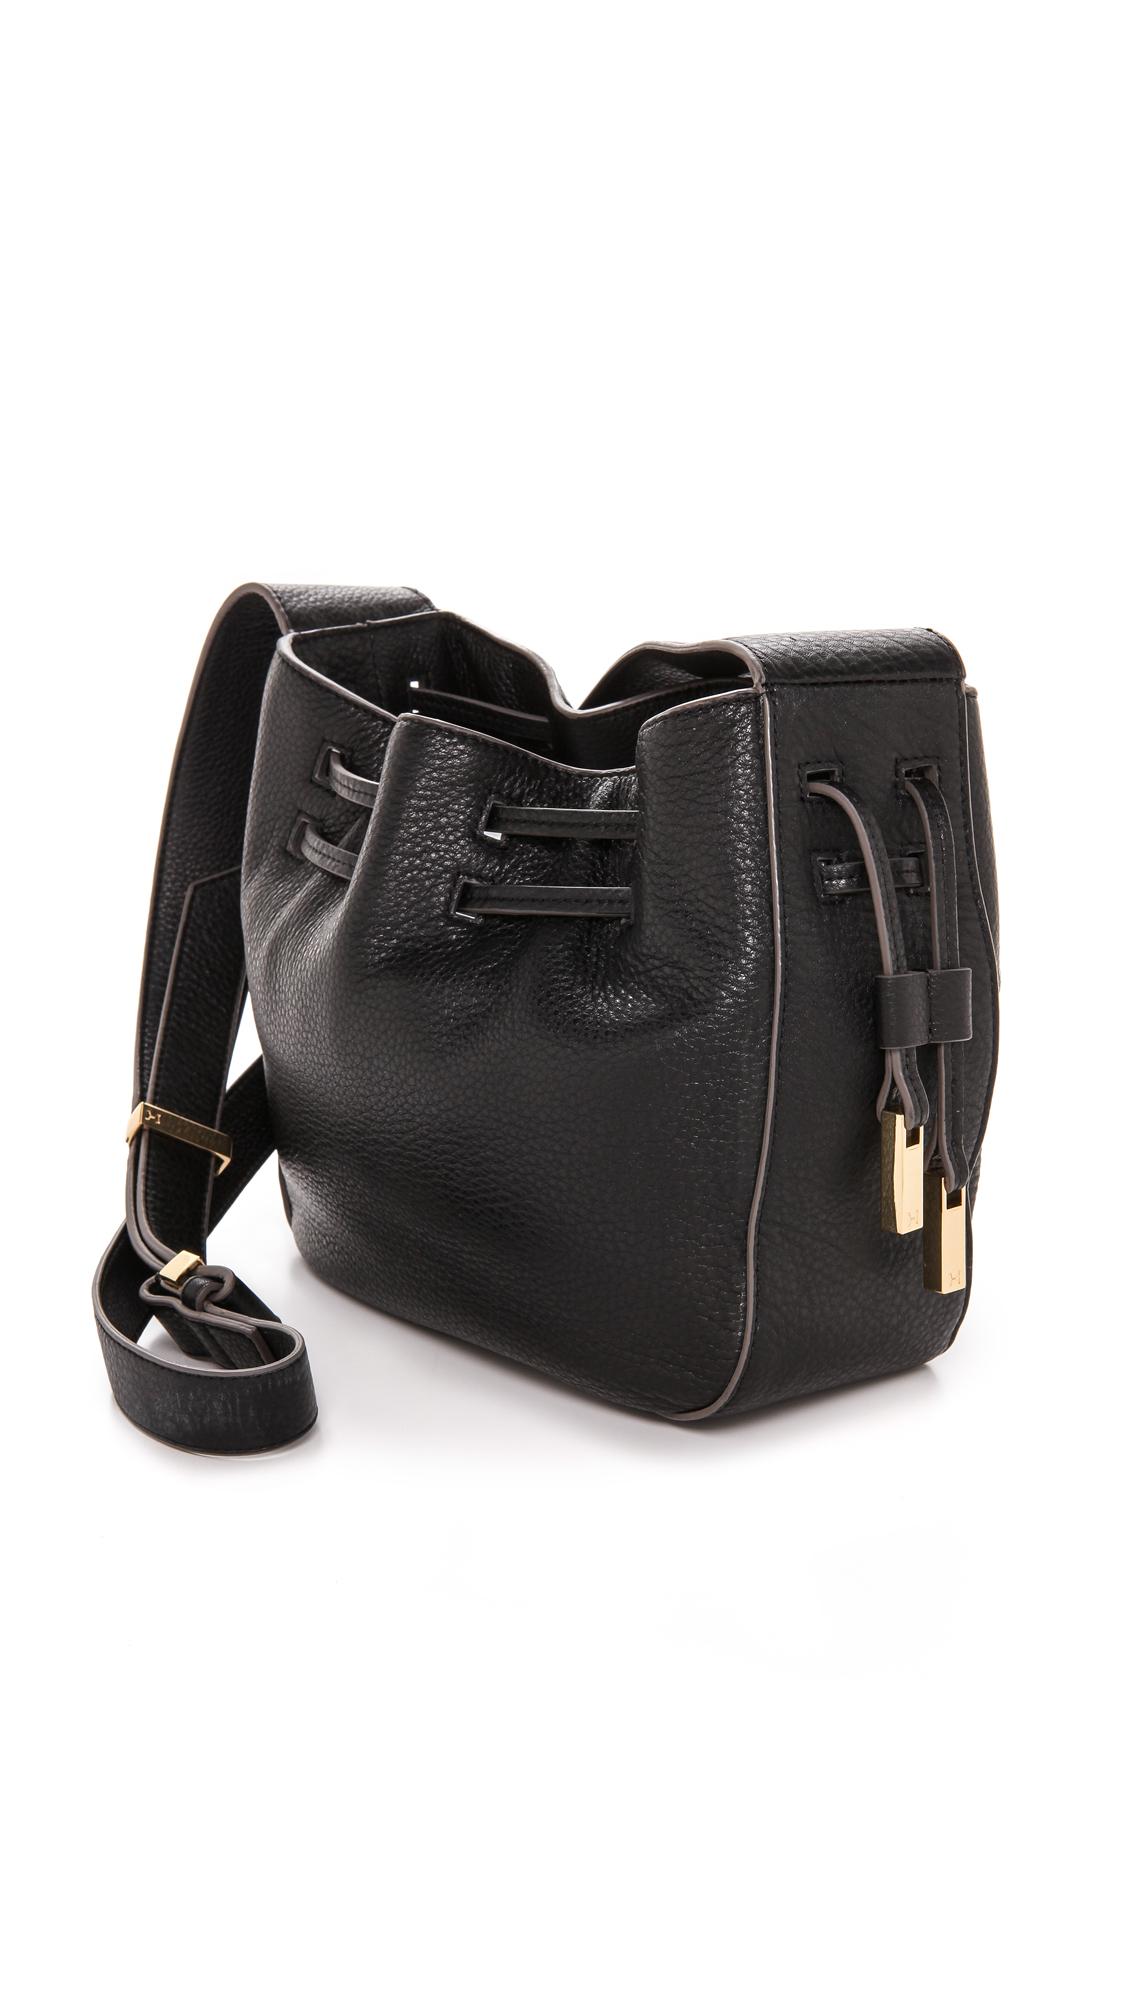 ebe98420c8 Lyst - Halston Bianca Drawstring Bucket Bag - Black in Black